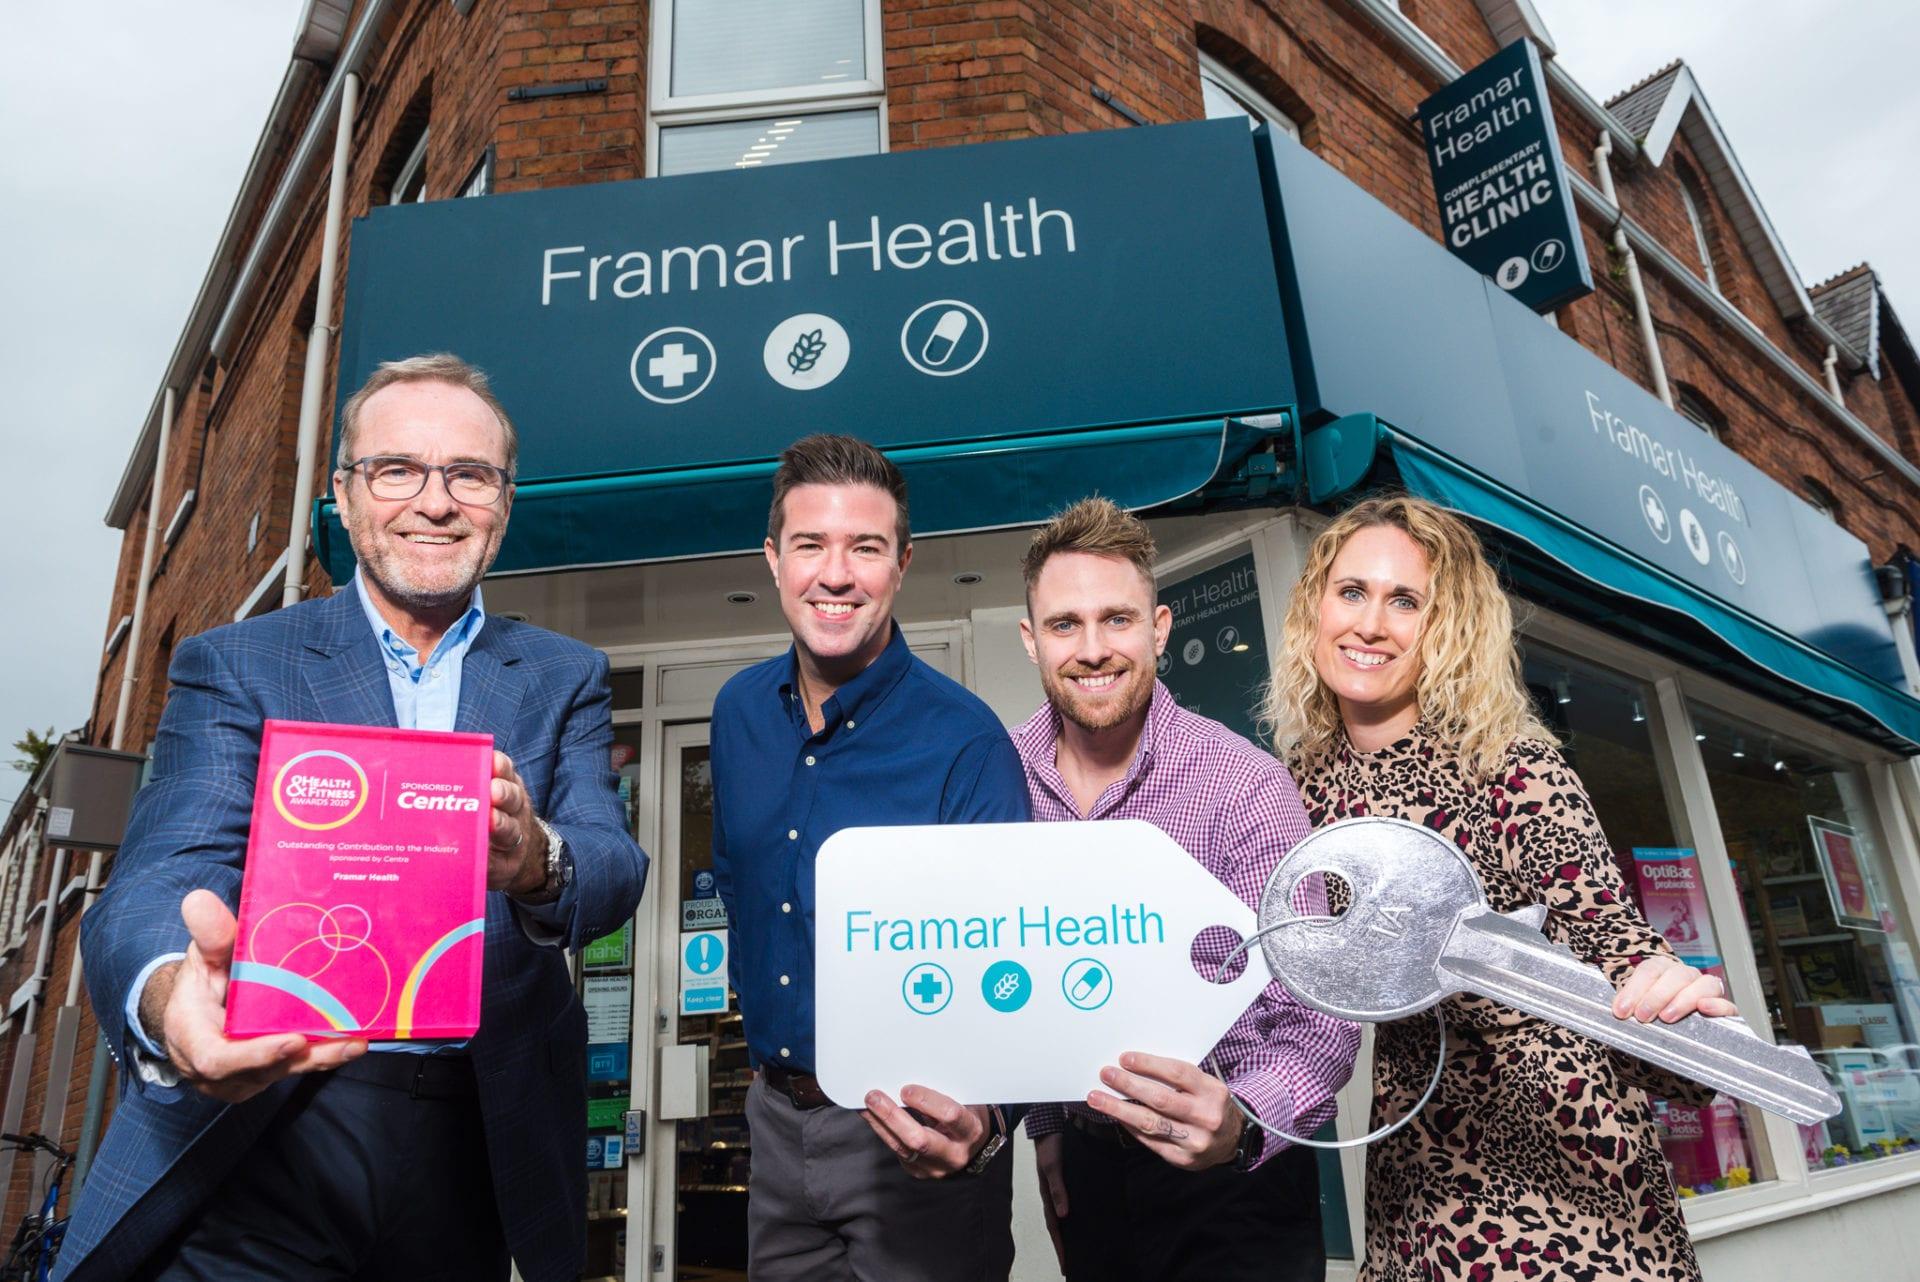 Framar Health